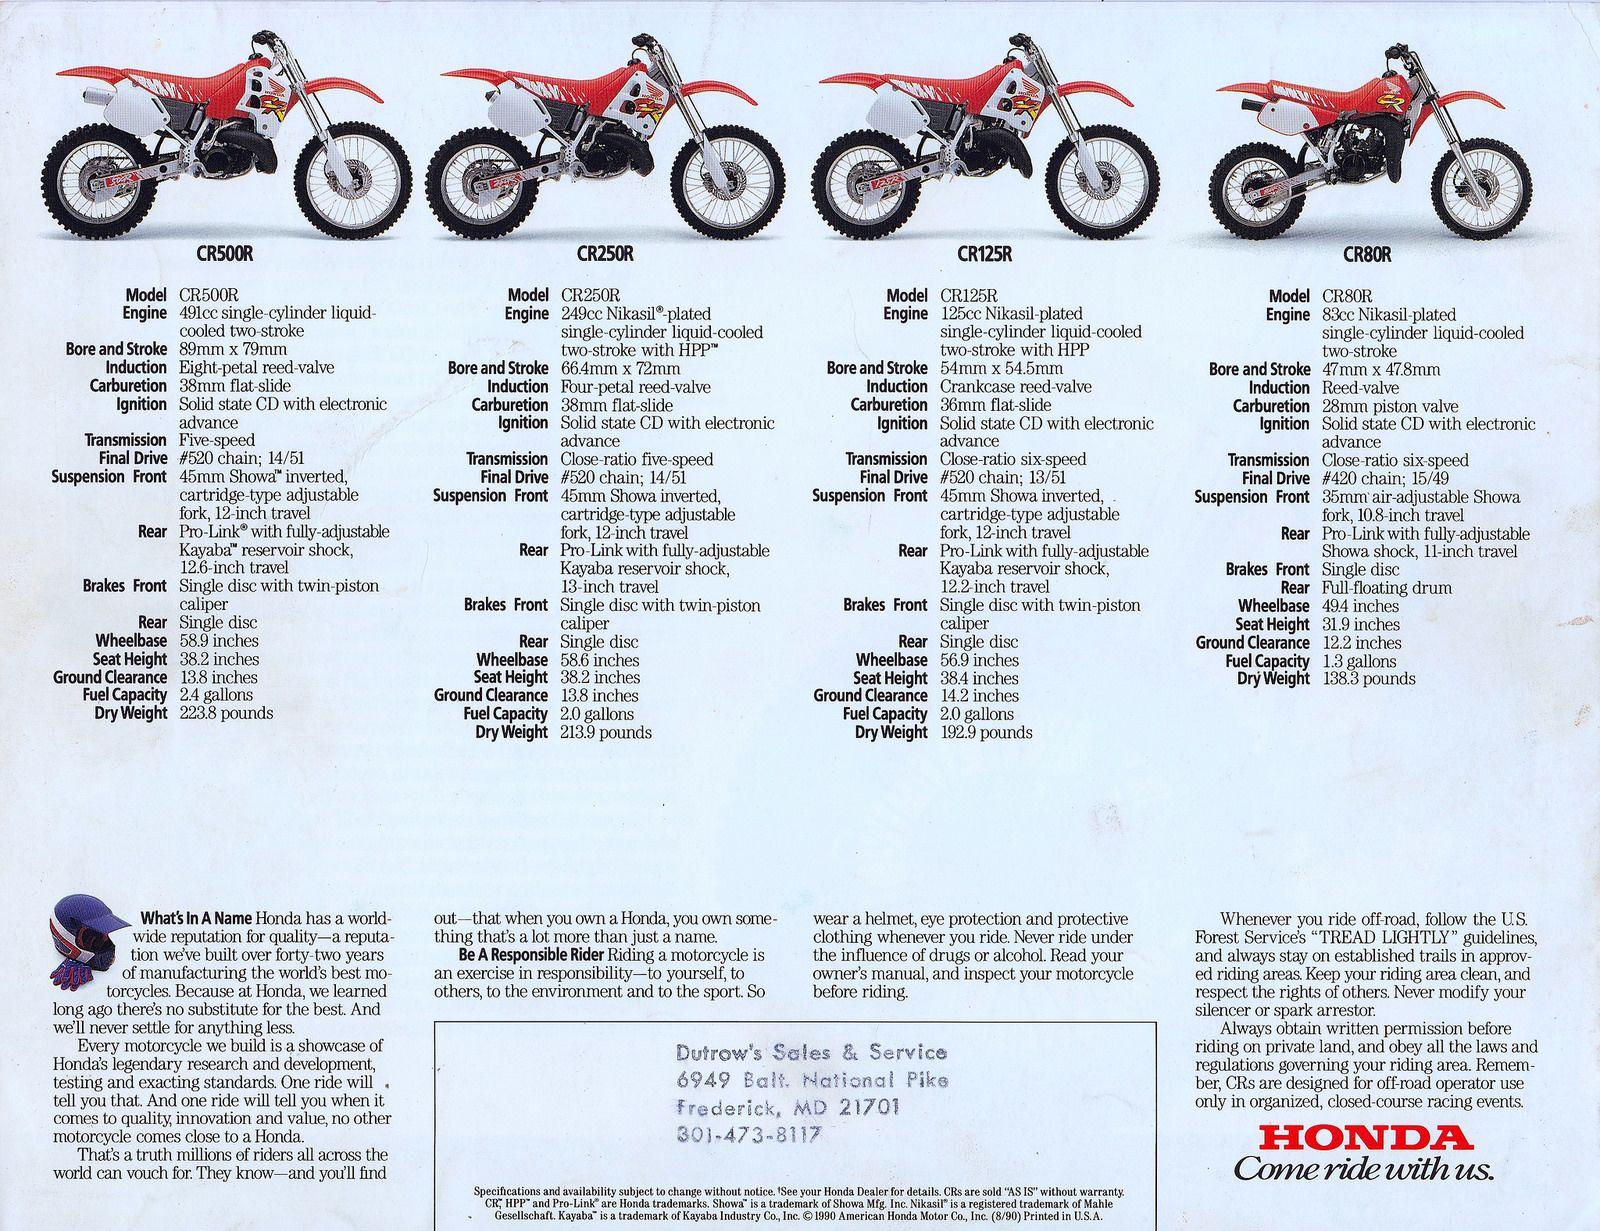 1991 Honda Cr80r Cr125r Cr250r And Cr500r Brochure Page 4 Honda Motorcycle Model Brochure